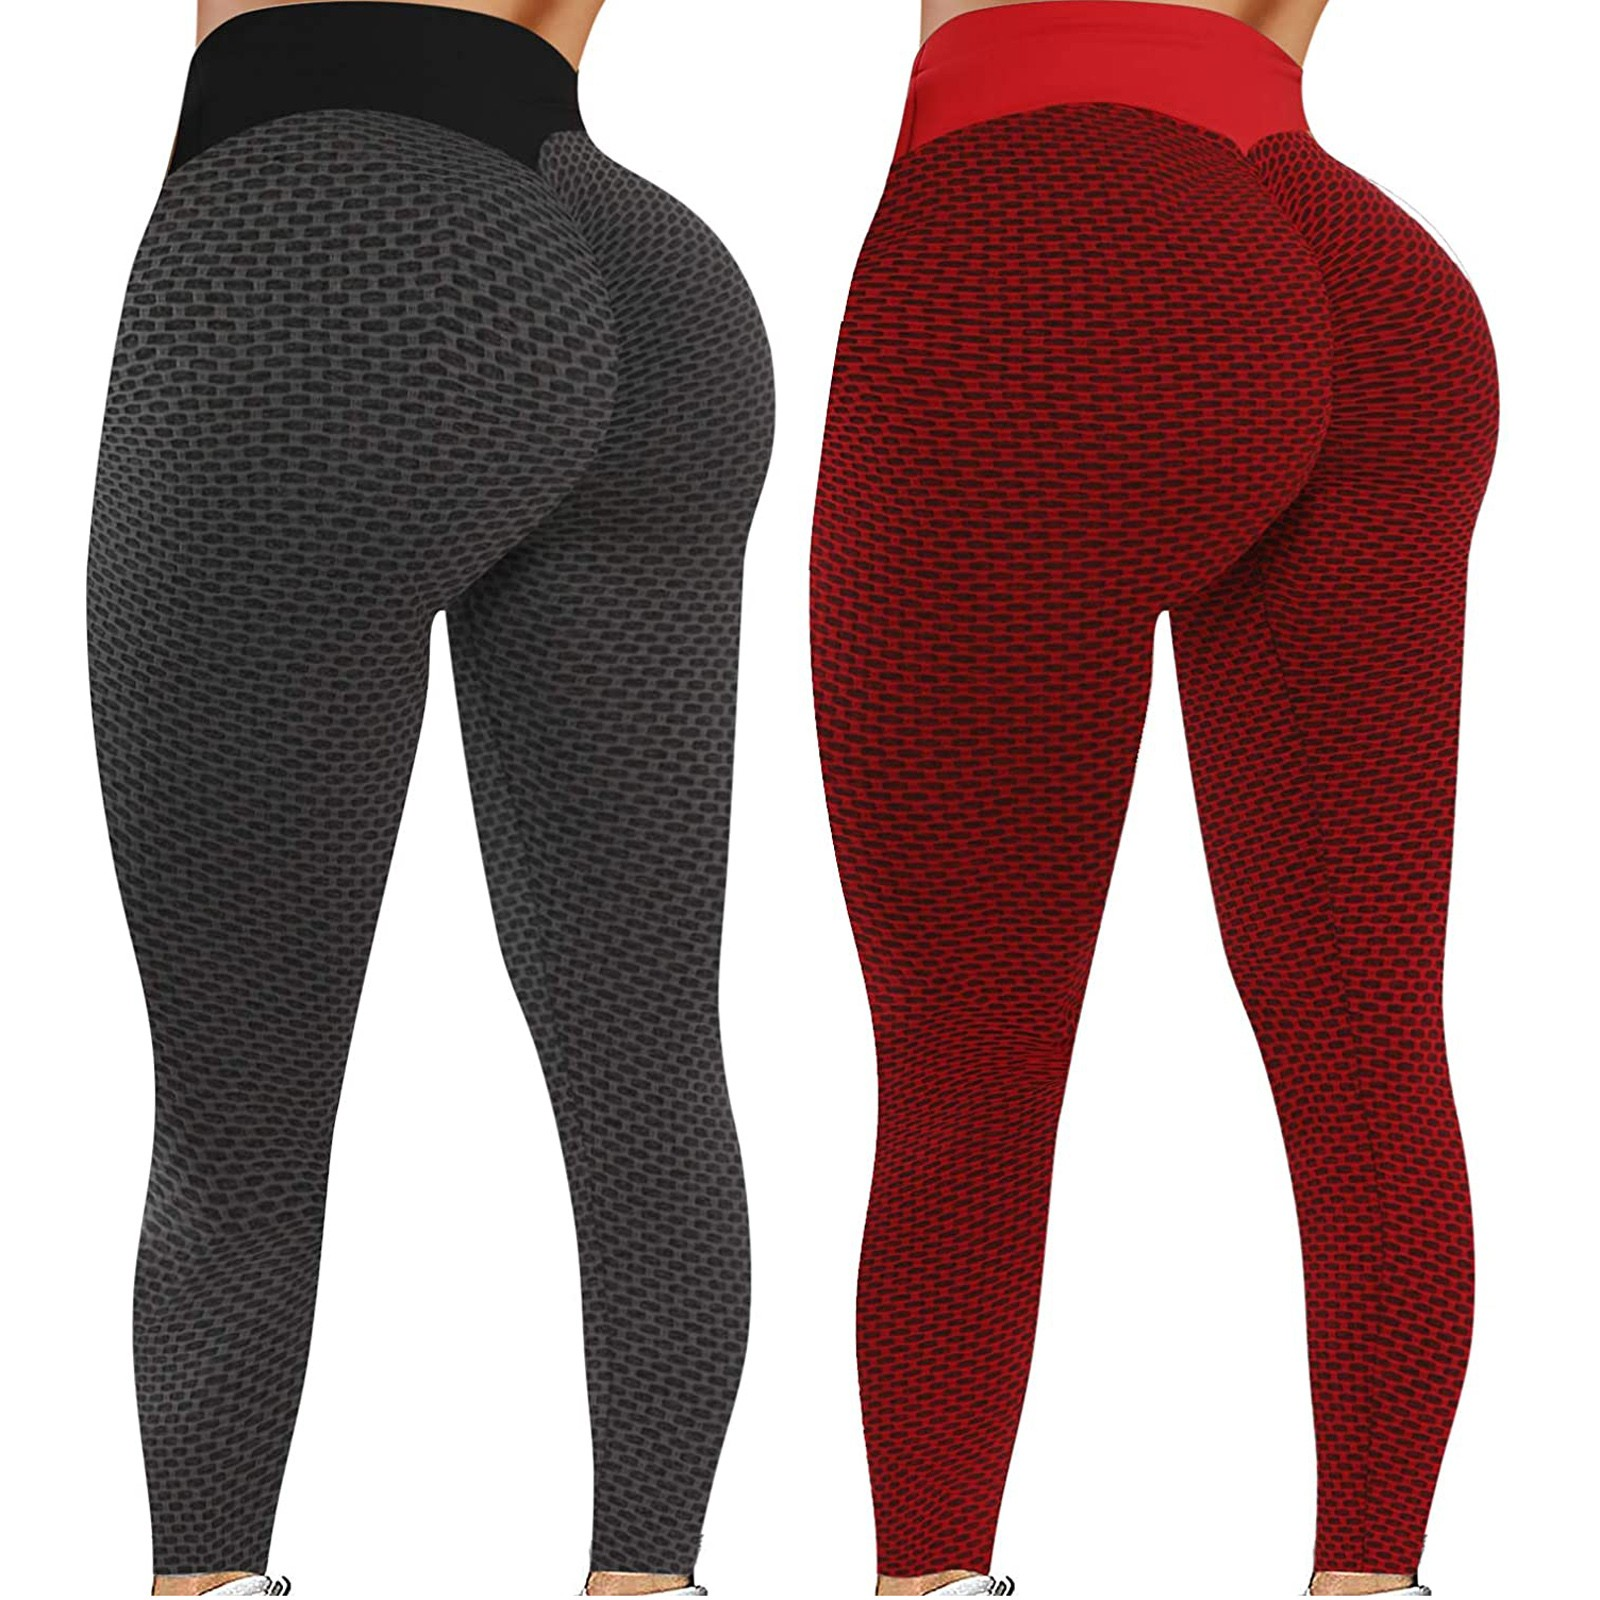 Women Yoga Pants Seamless Butt Lift Fitness Leggings Running Gym Sports Trousers